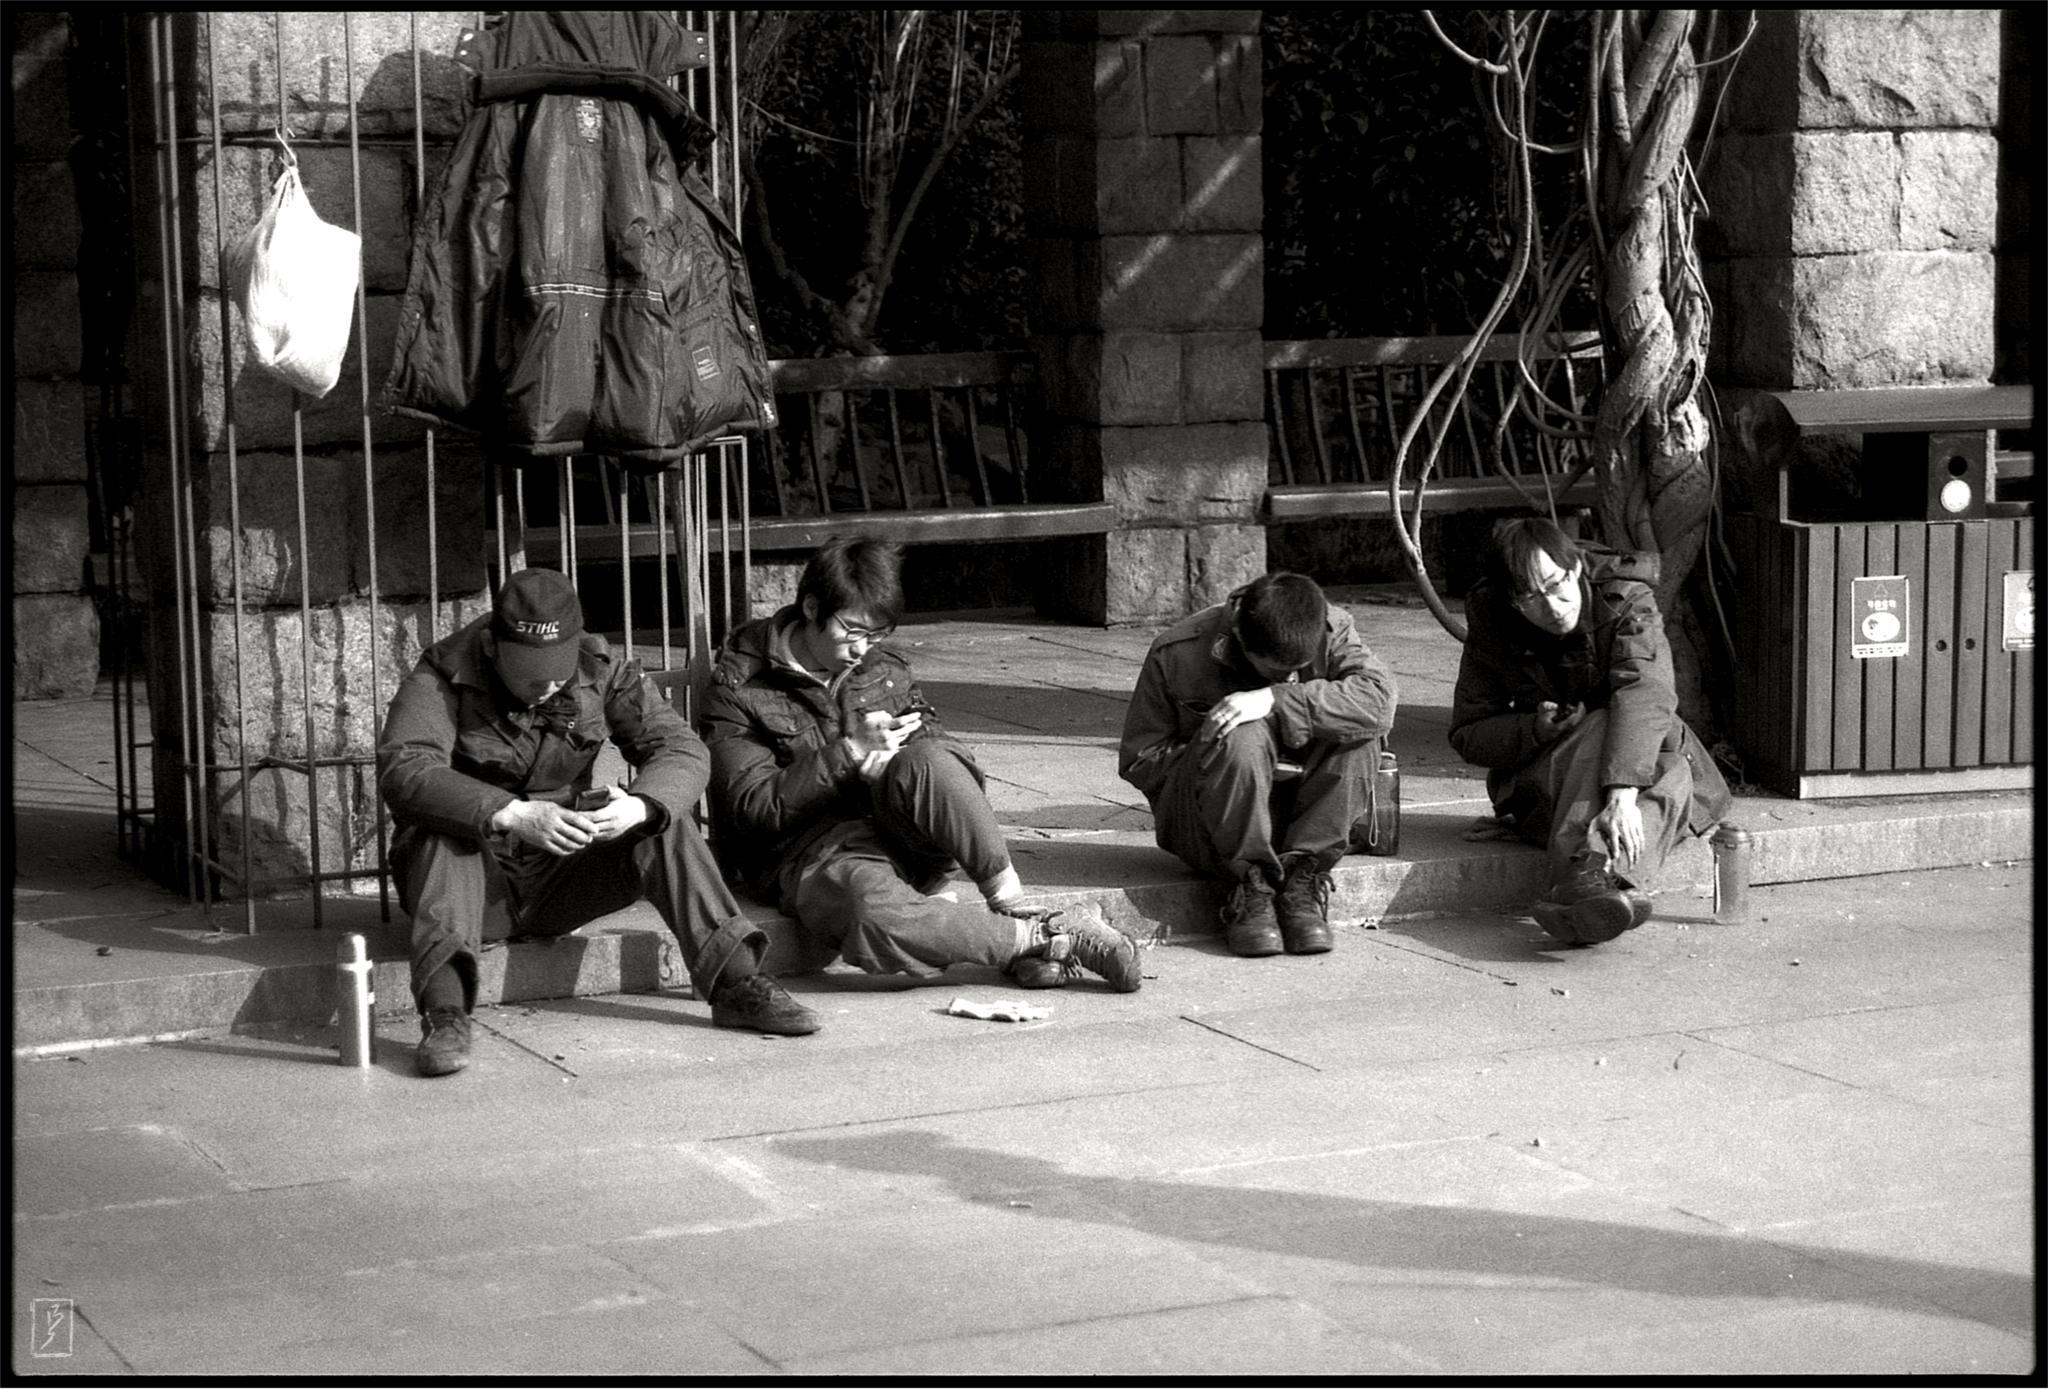 Lu Xun park (): Young gardeners on a break using their smartphones.